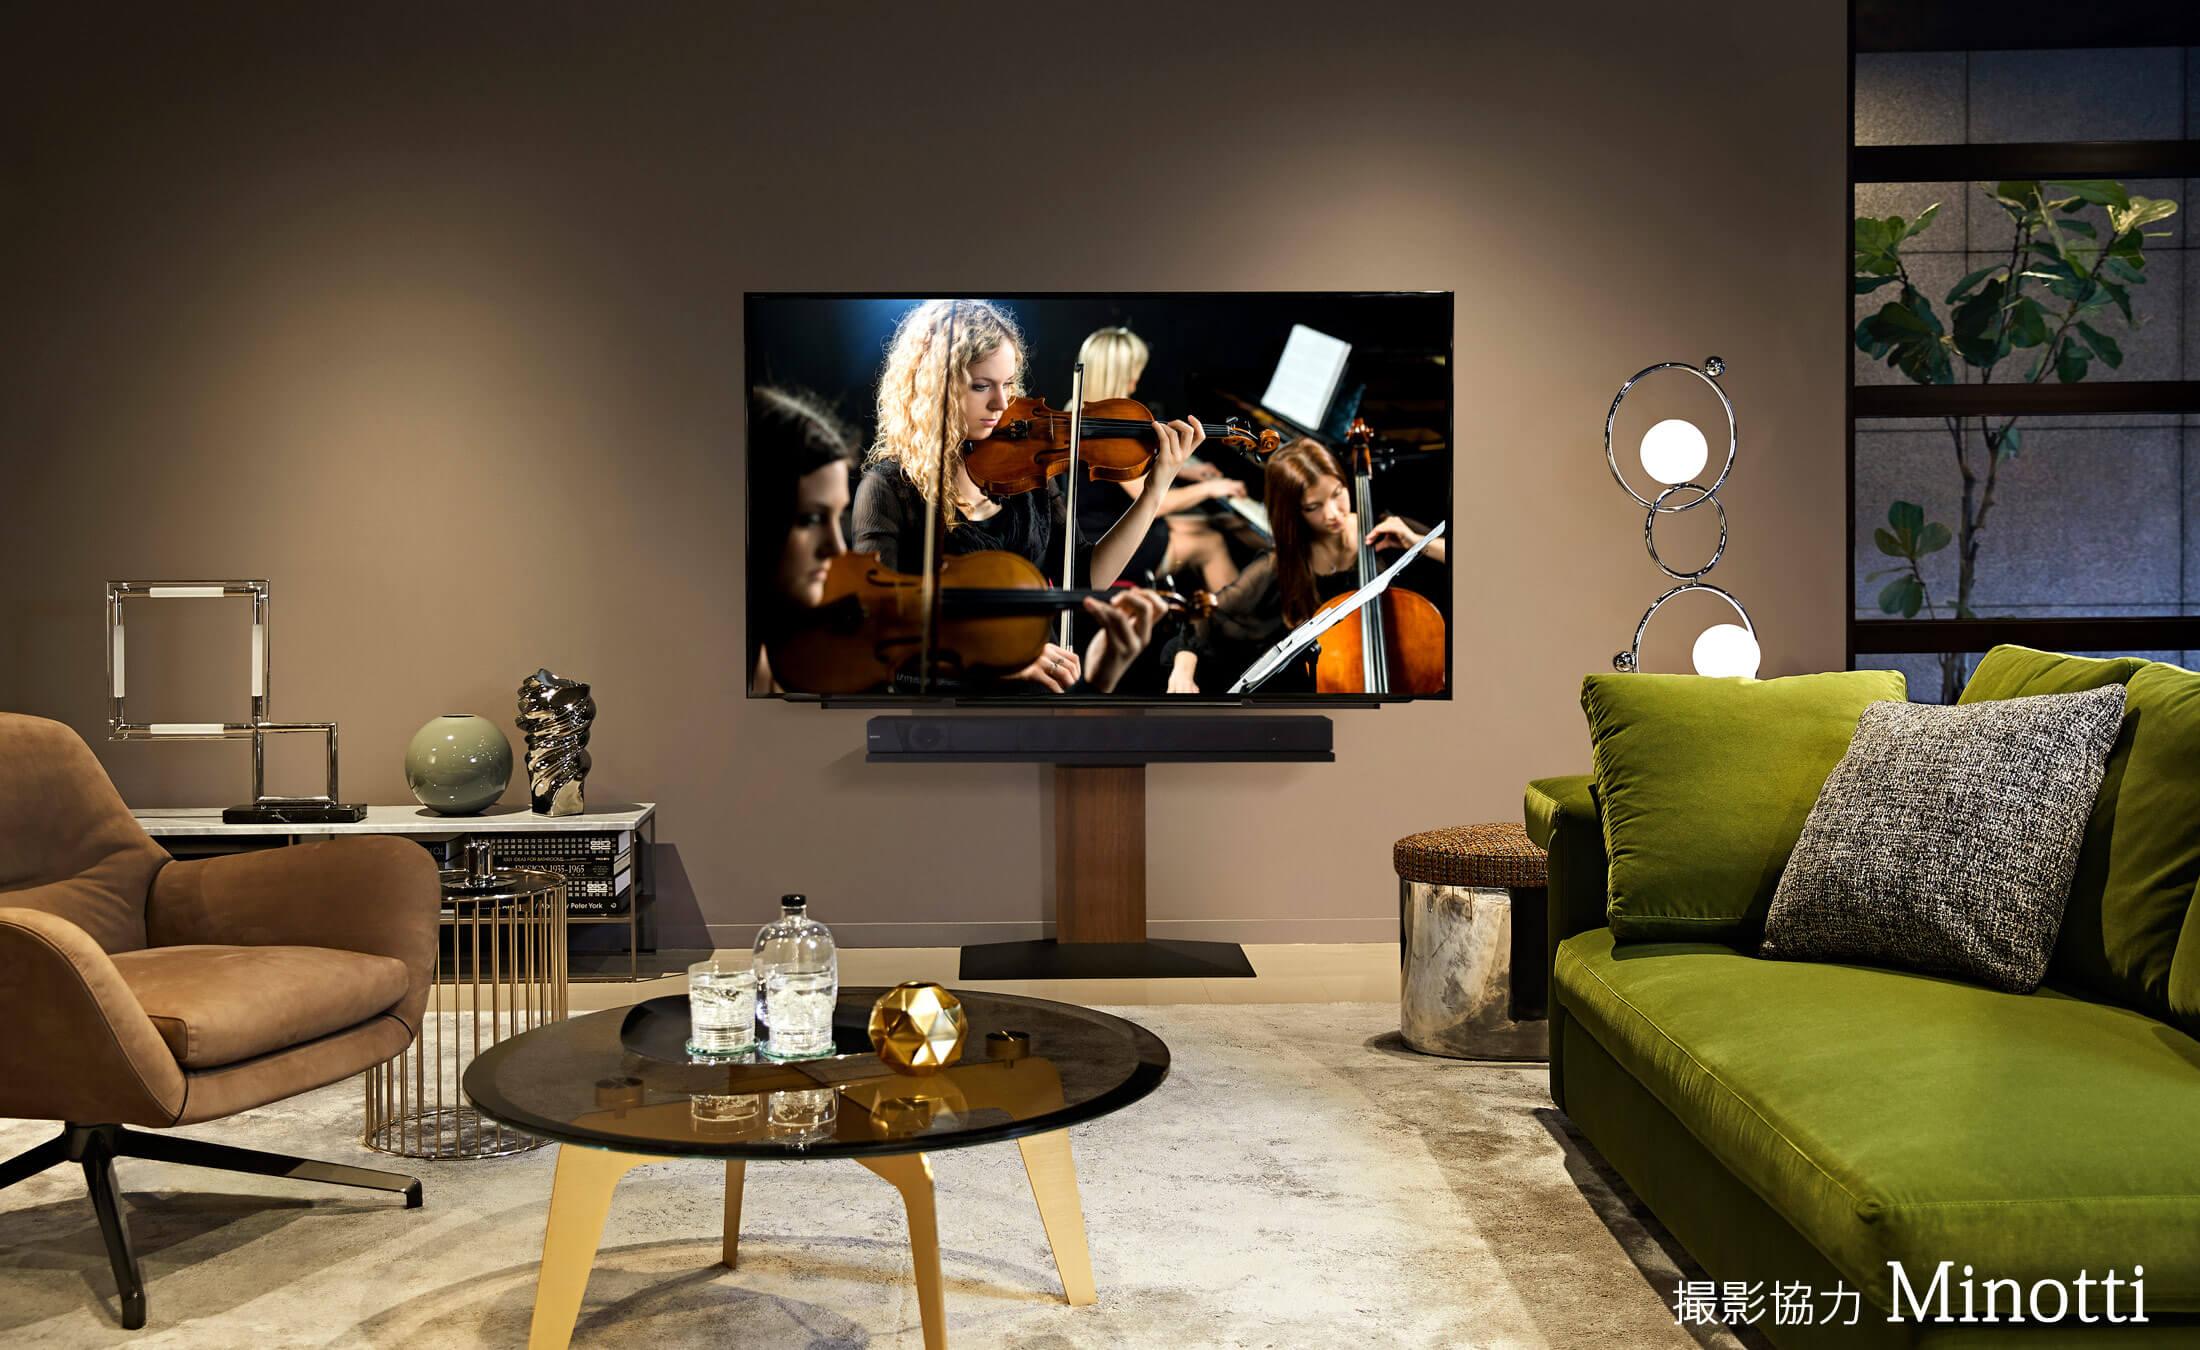 WALL INTERIOR TV STAND V3 壁寄せテレビスタンドV3 LIVING ROOM 2枚目